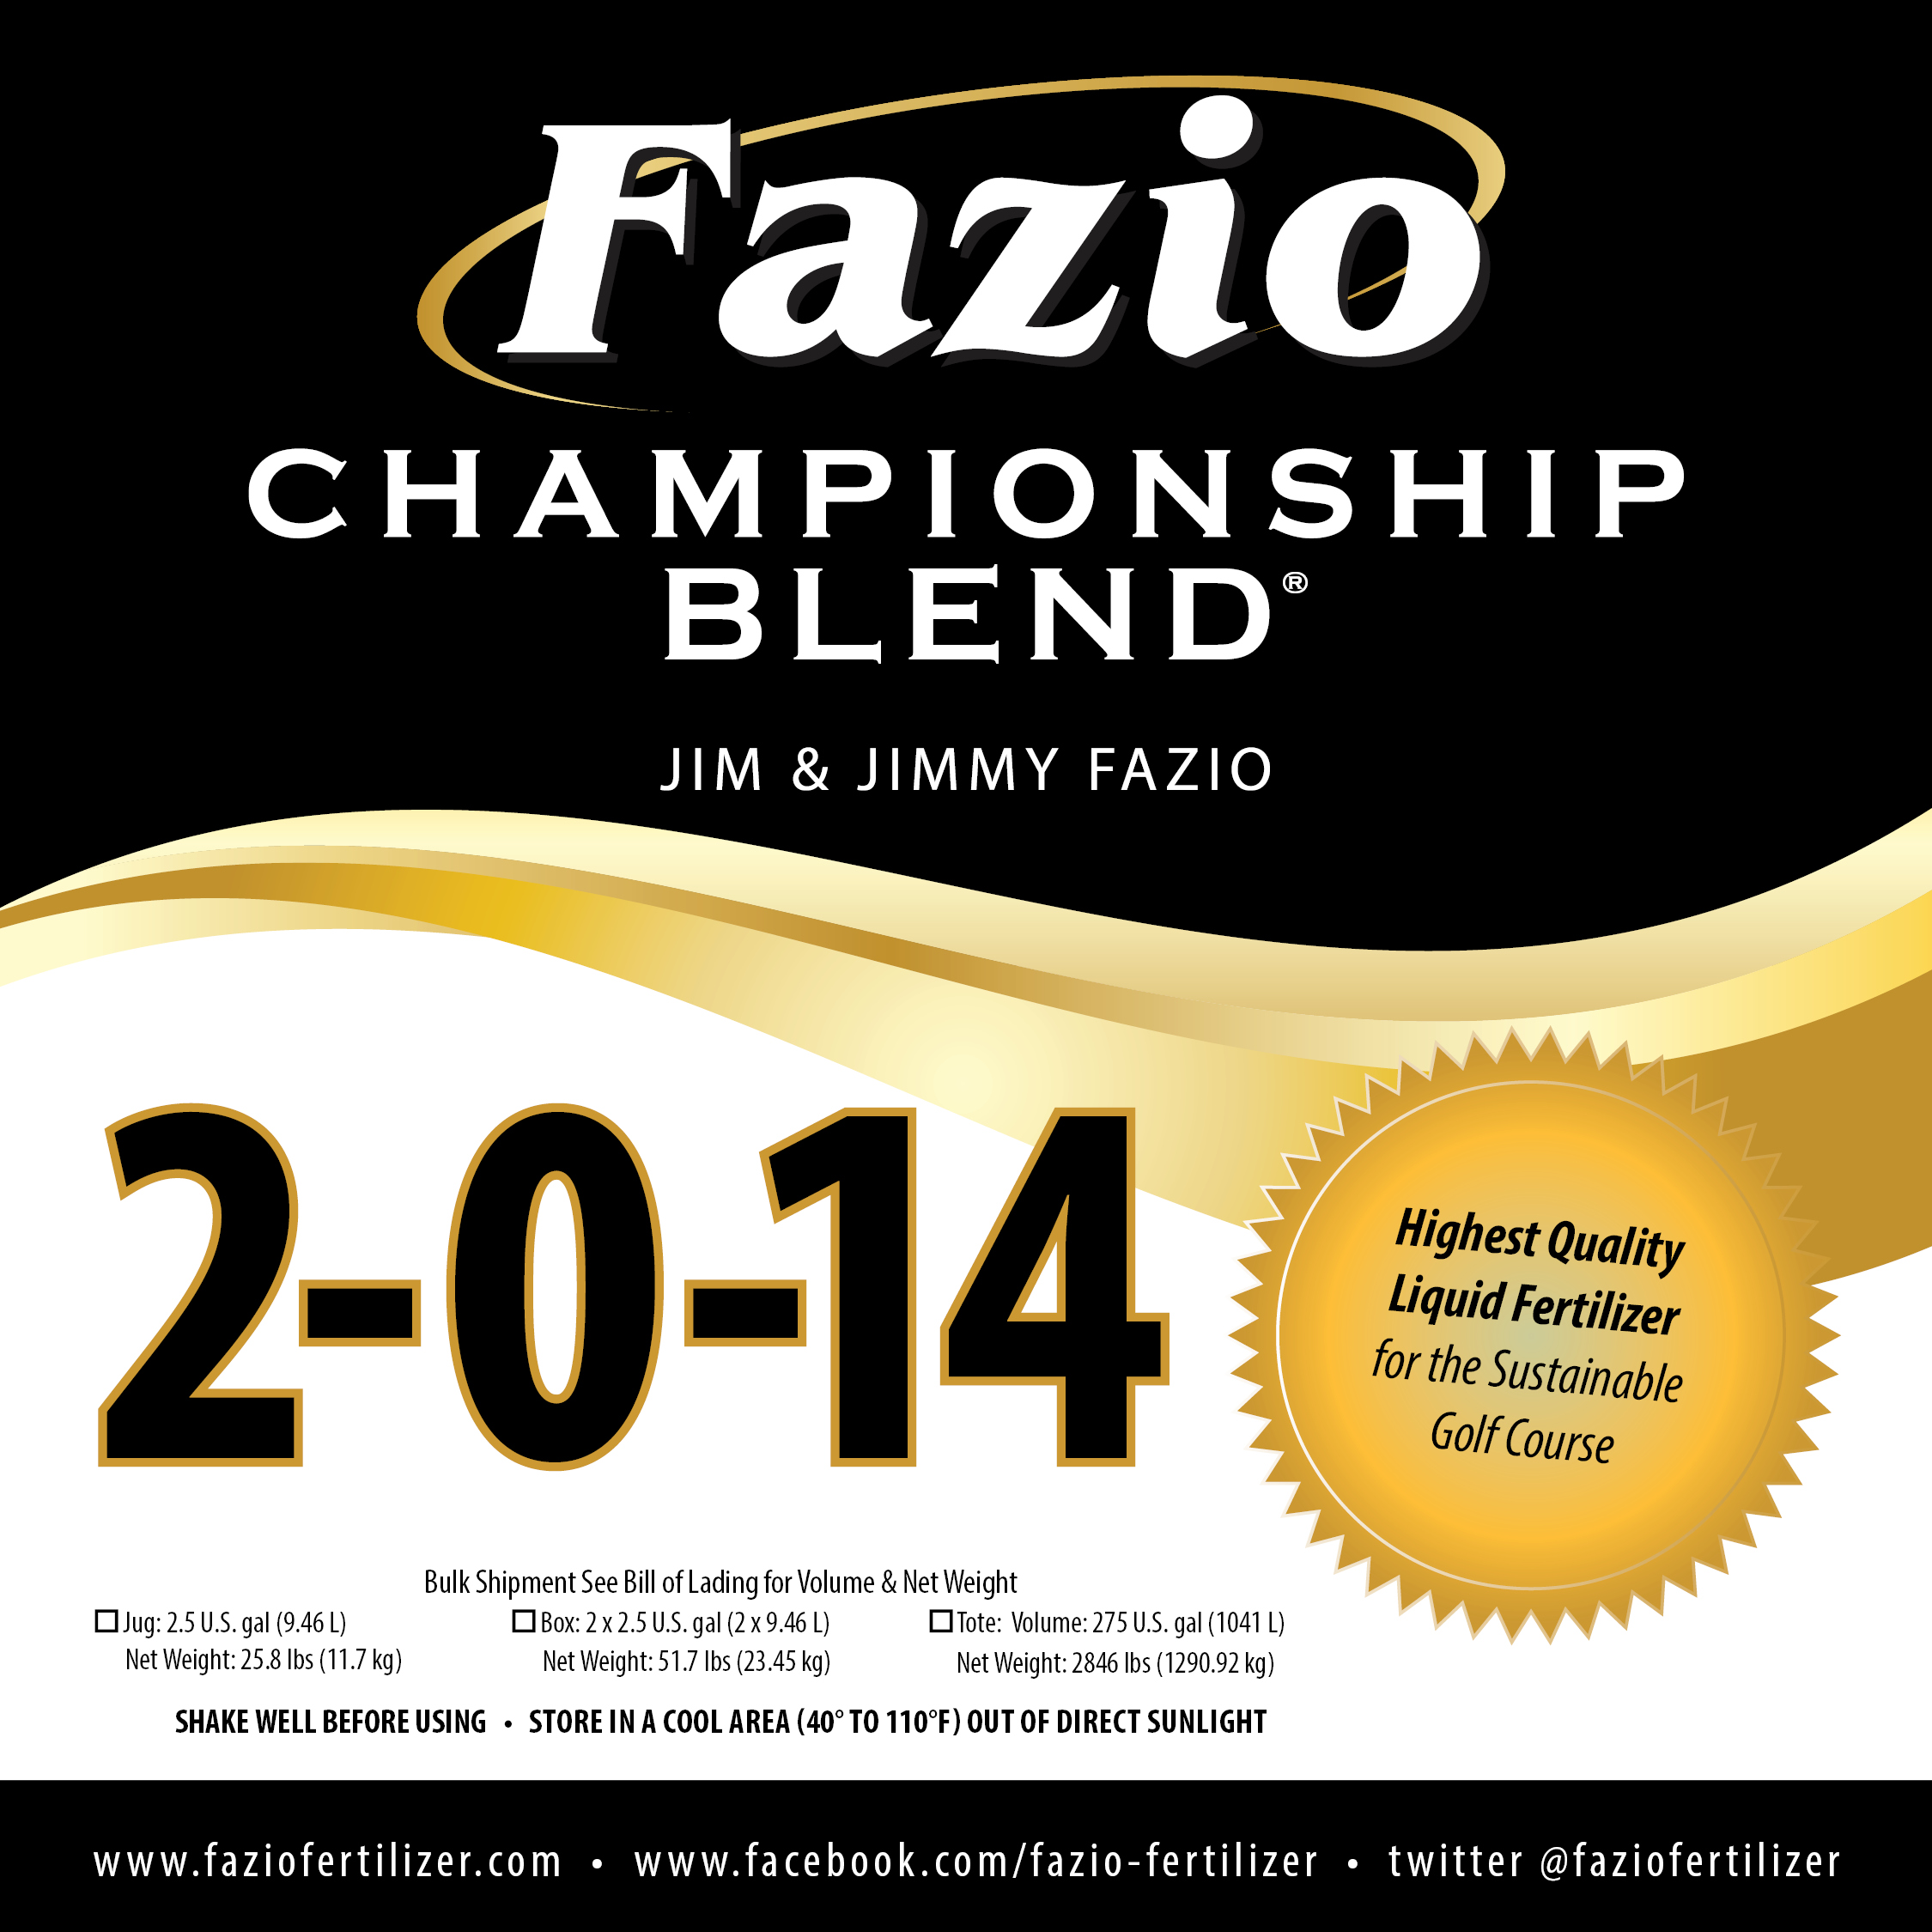 Fazio Championship Blend 2-0-14